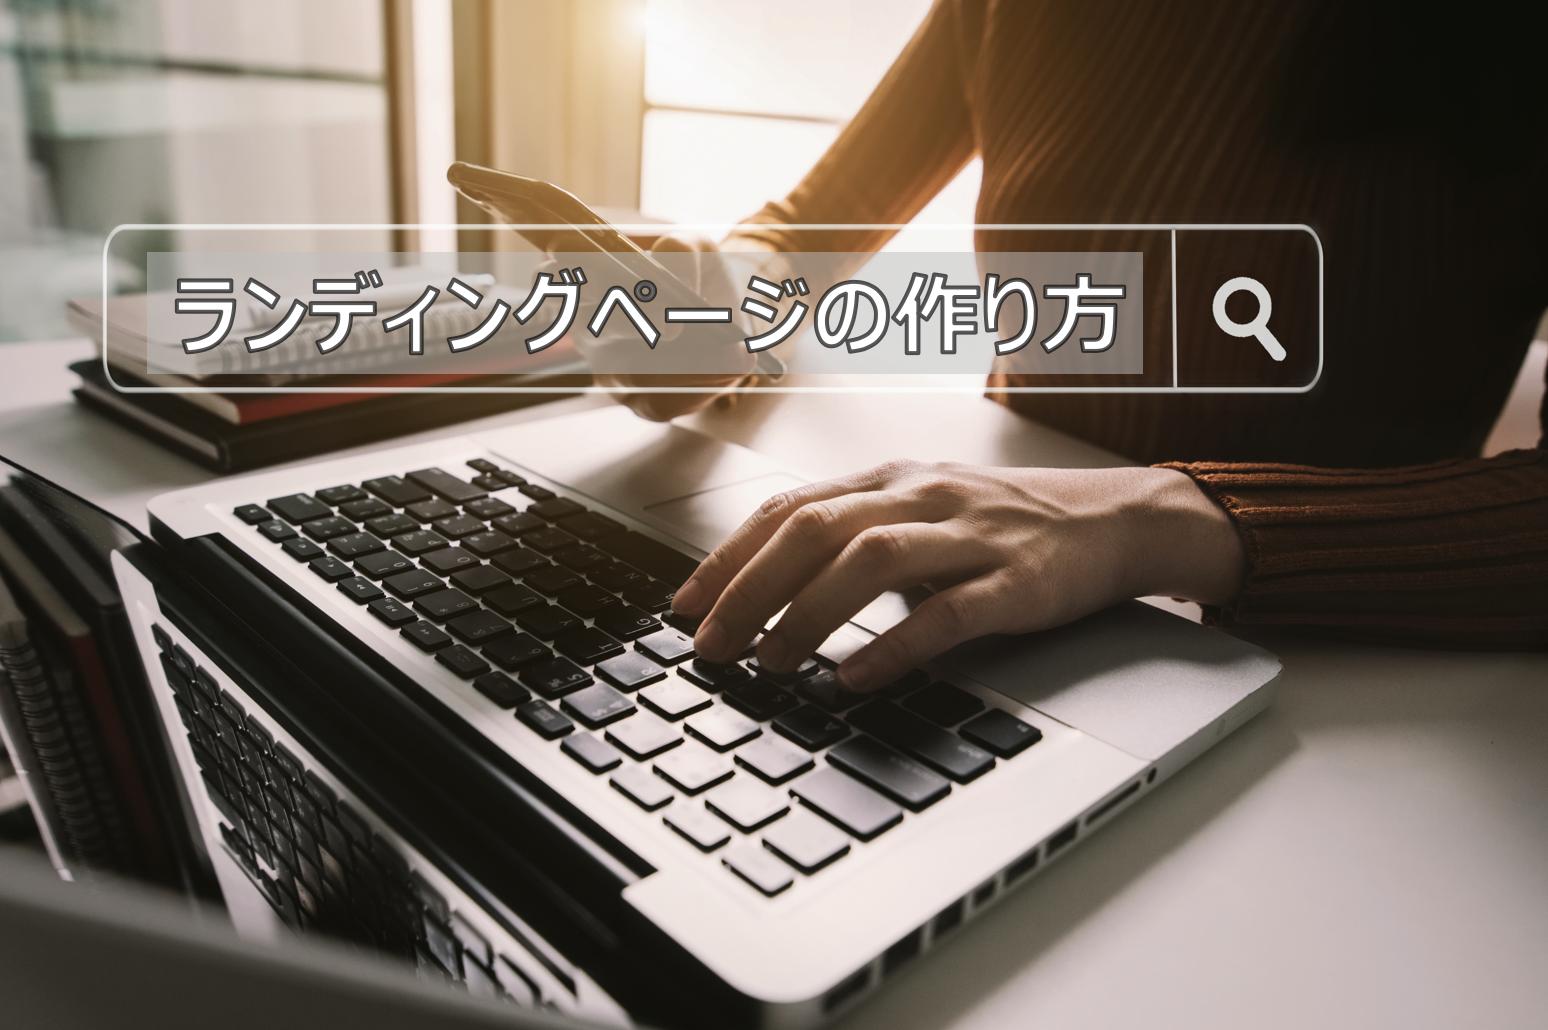 Pardotランディングページの作りかた① 〜初めて作る編〜